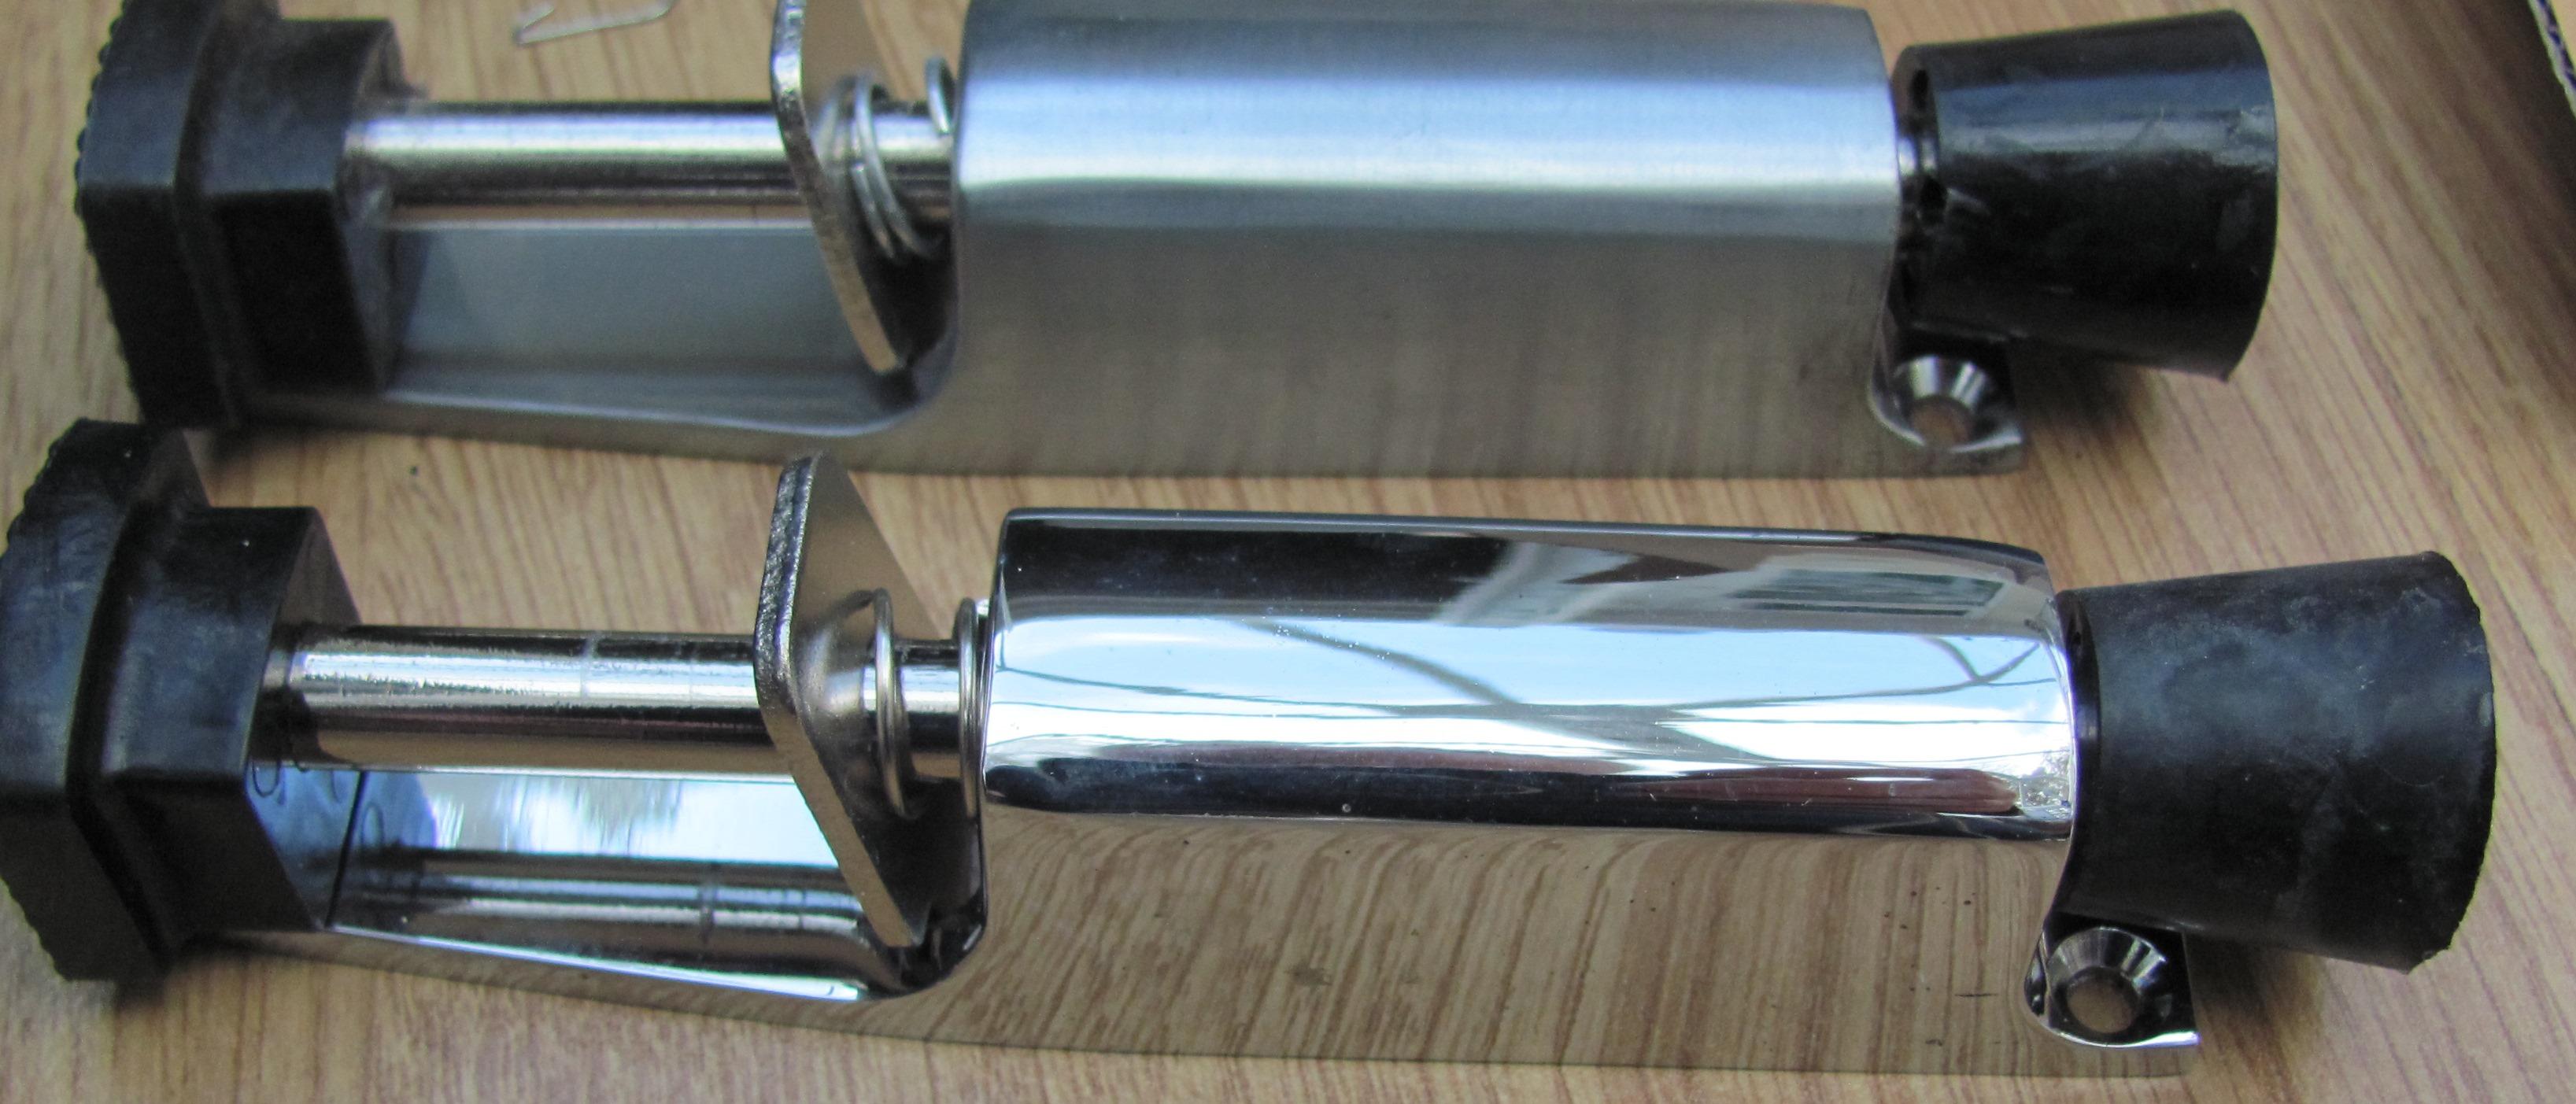 45 x Chrome / Satin chrome Jedo Door holders stops DIY